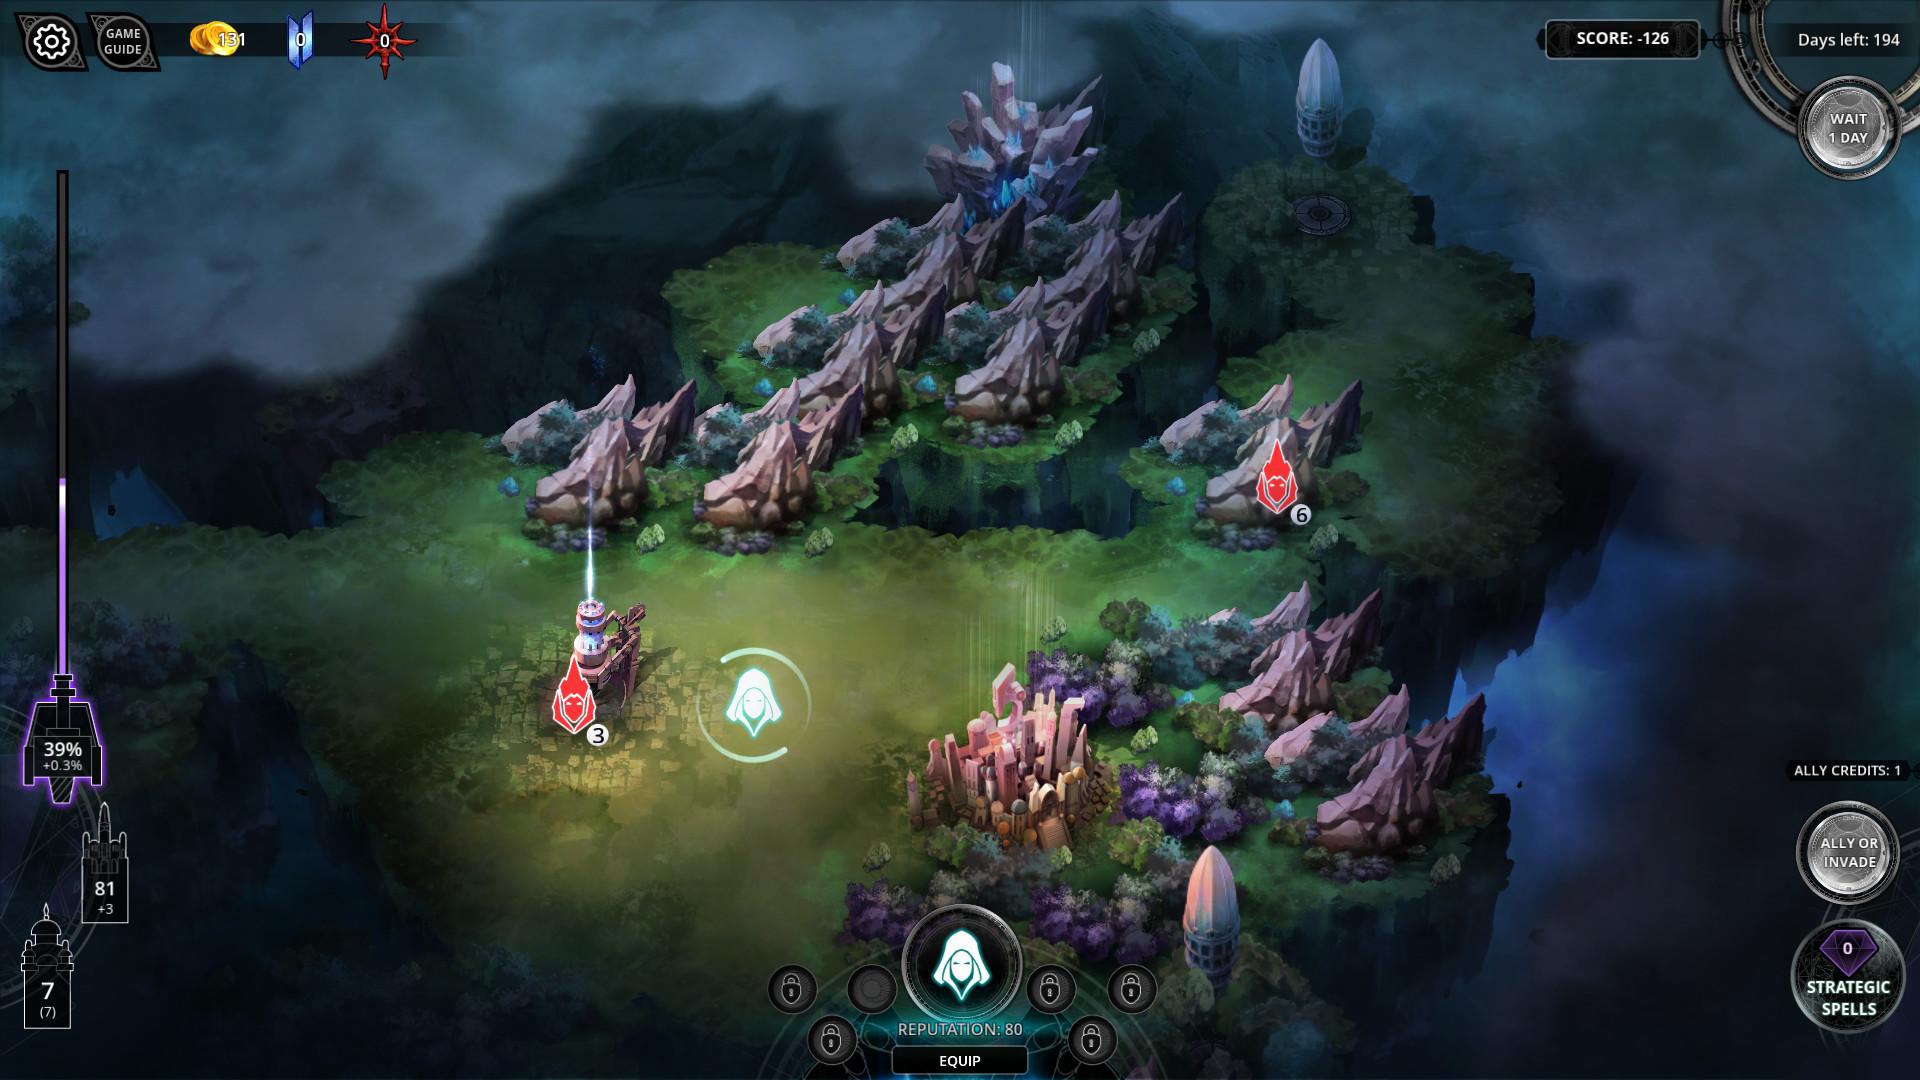 Chaos Reborn (Steam key) Region Free 2019